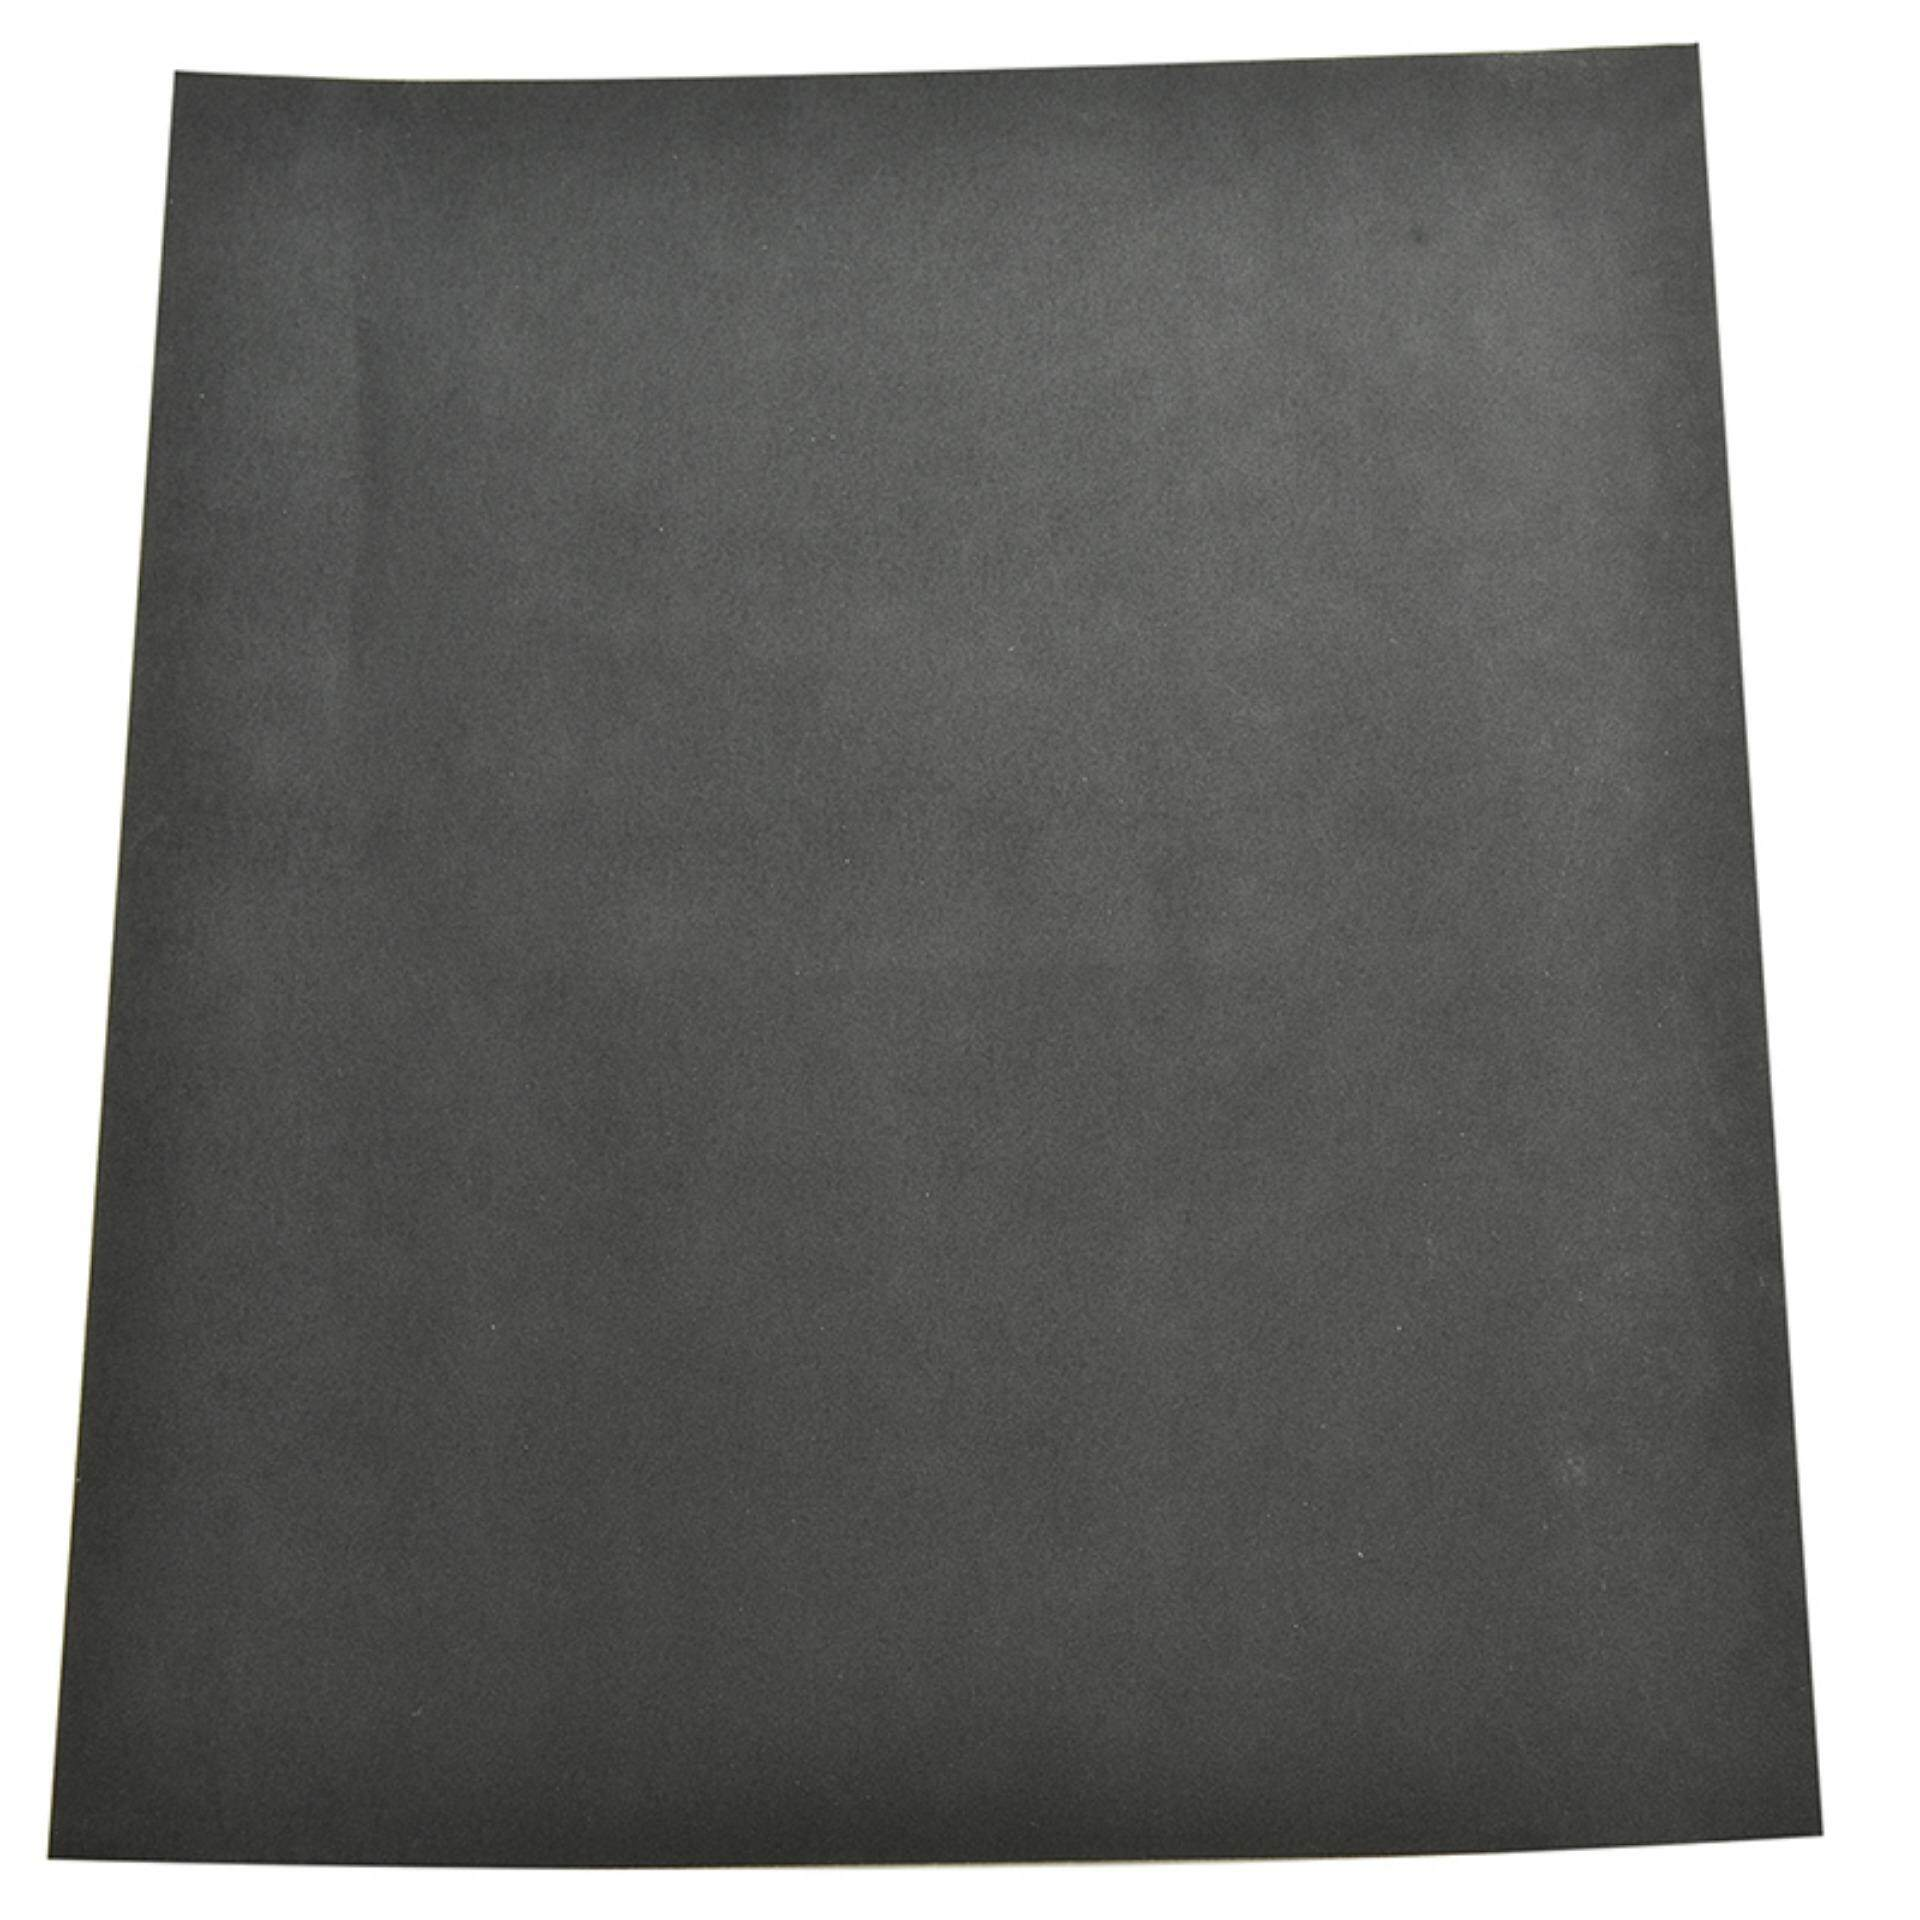 Hình ảnh Waterproof Abrasive Sand Paper Wet And Dry Sandpaper Grit ST 1200# - intl